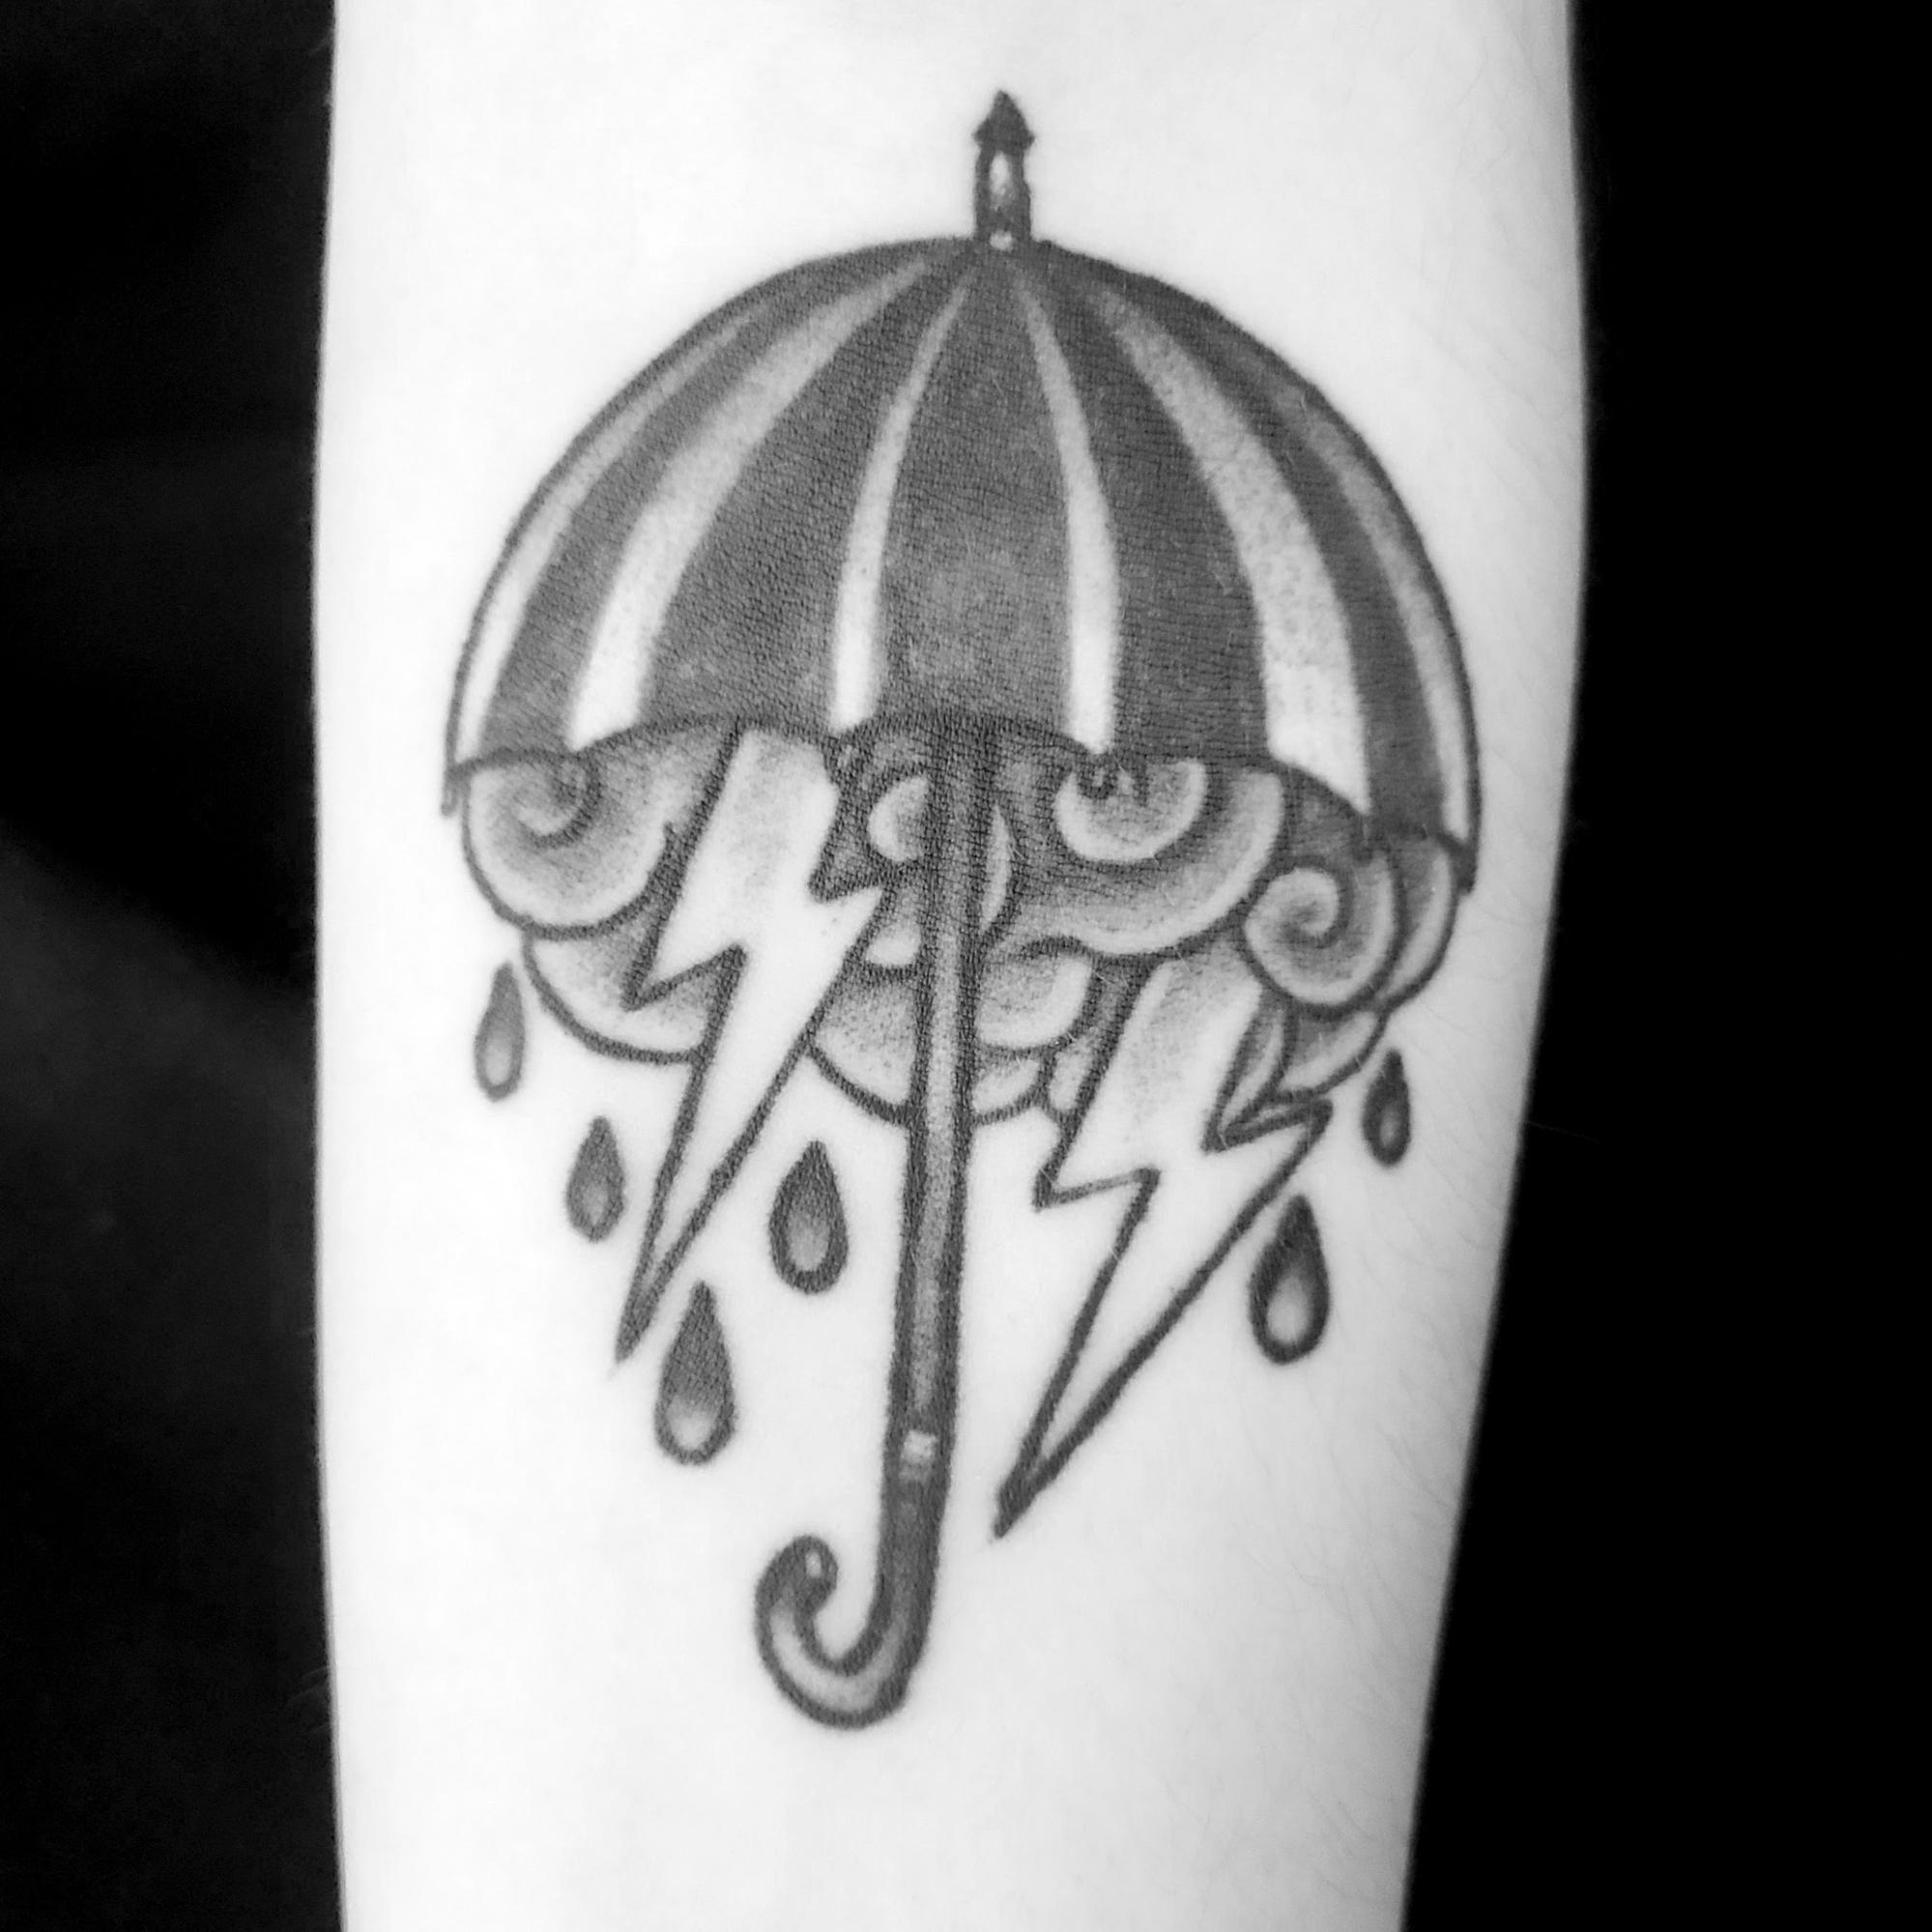 rainy days concept tattoo